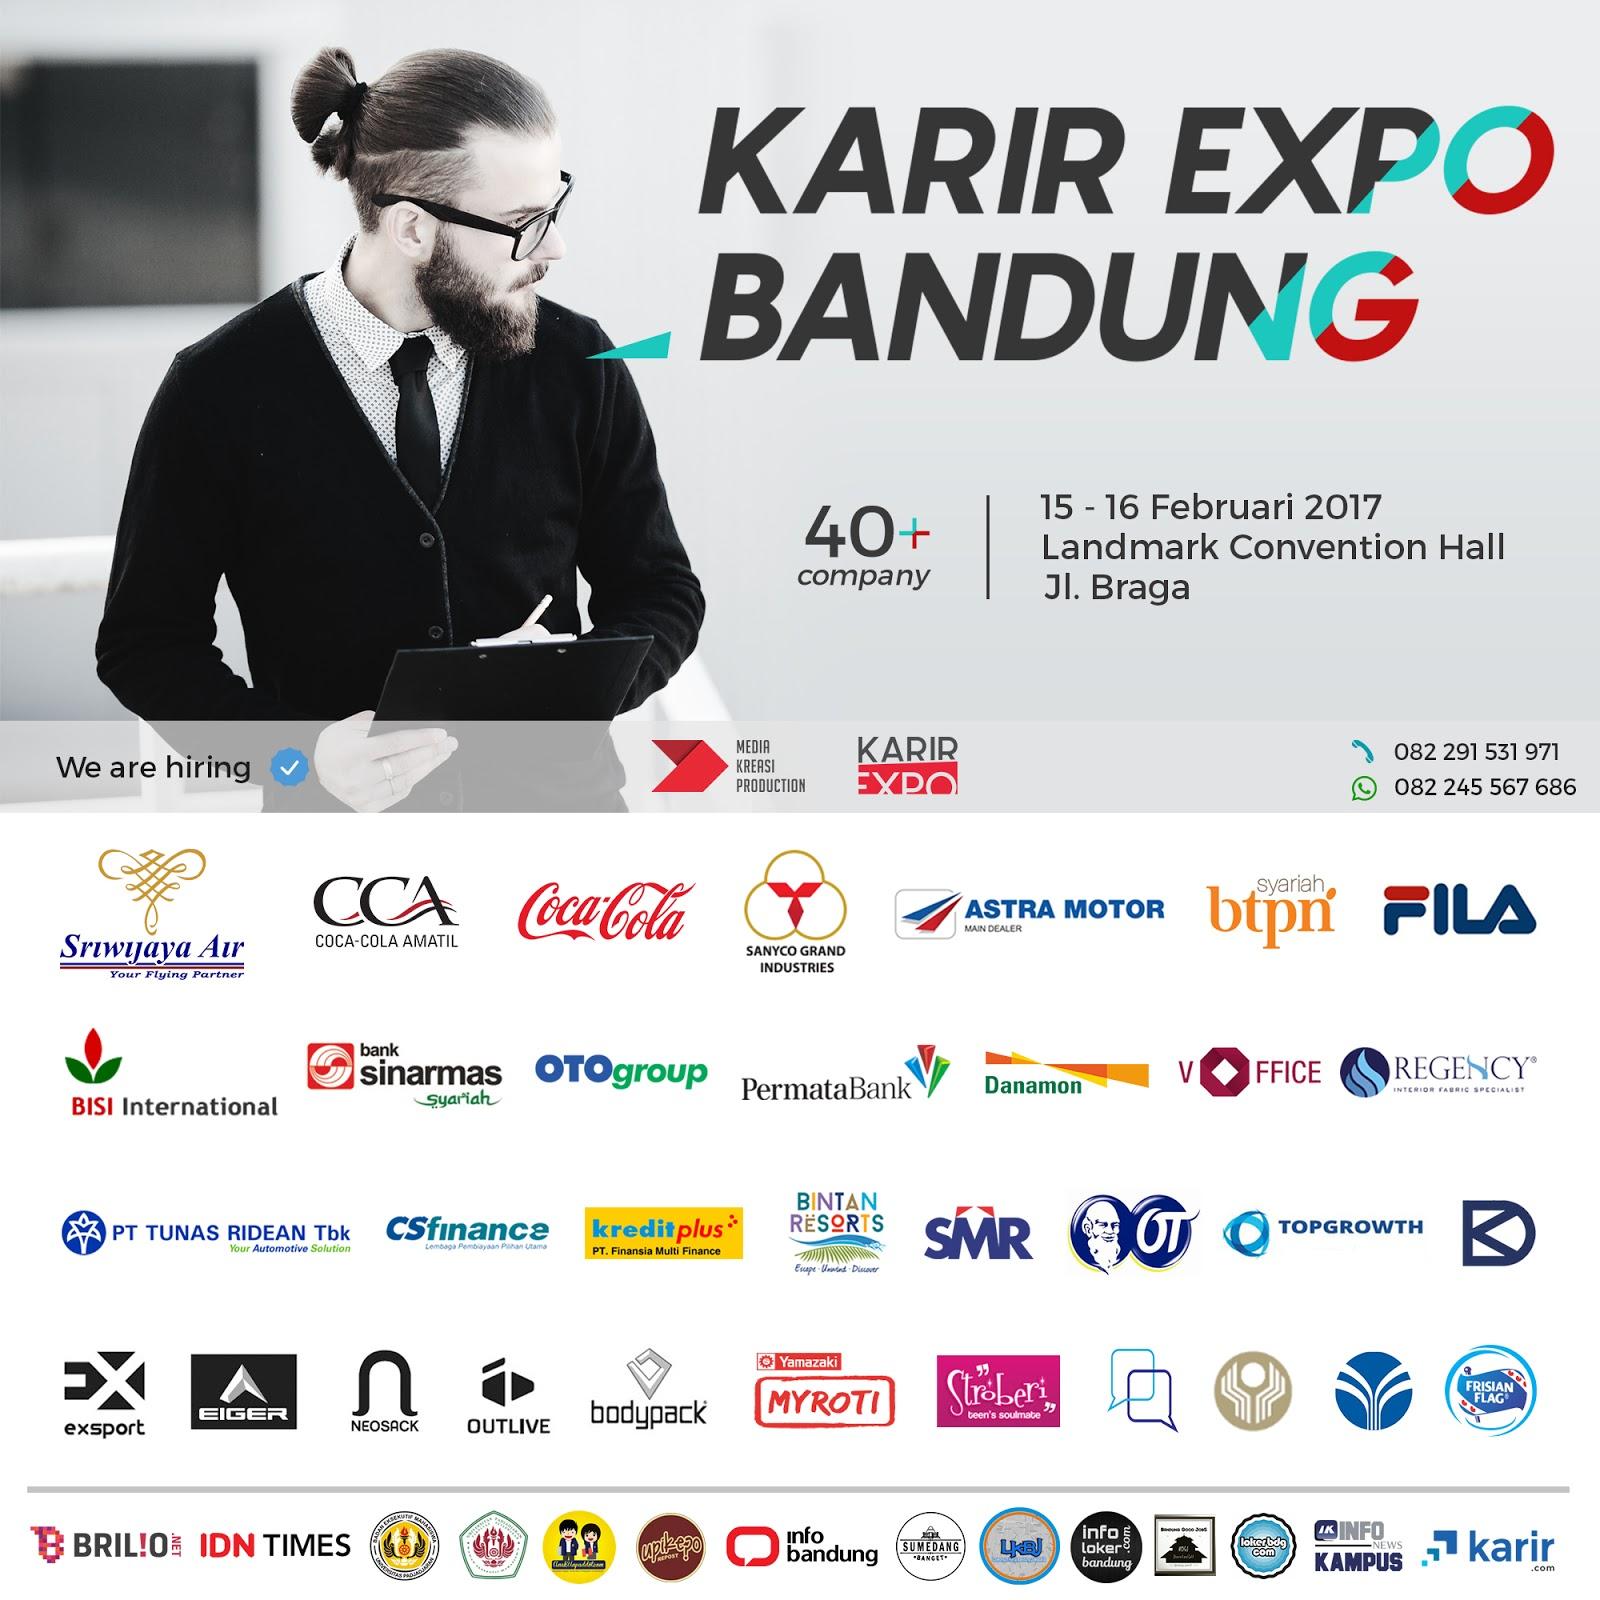 Karir Expo 15 s/d 16 Februari 2017 Landmark Convention Hall